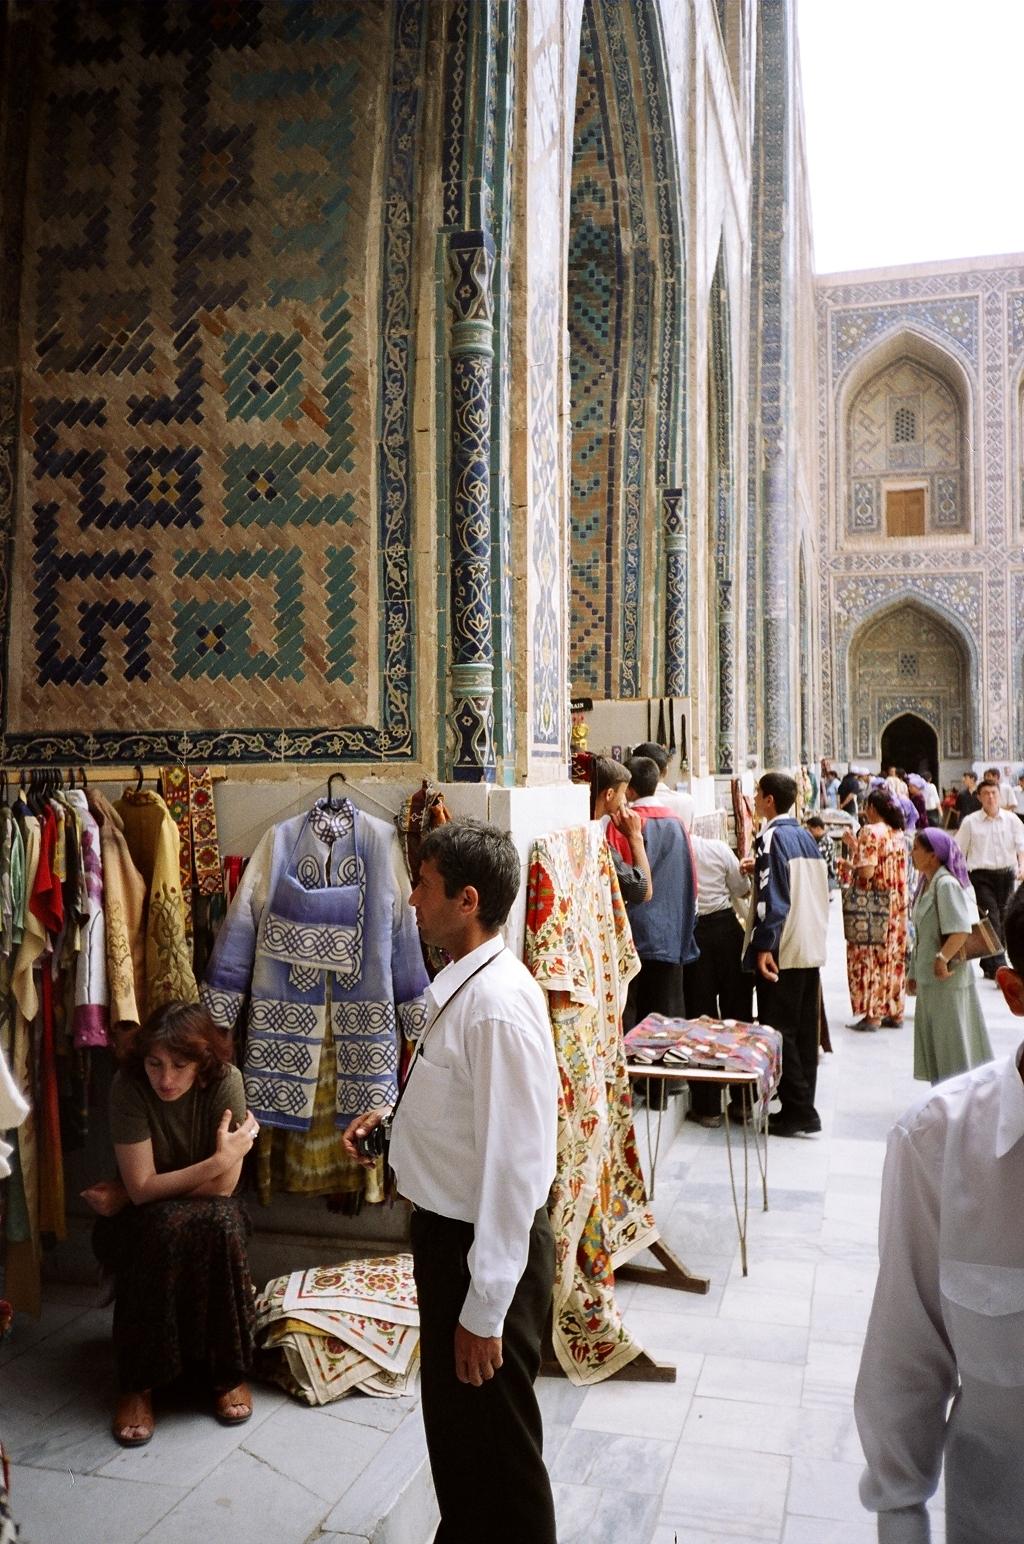 Registan Samarqand Usbekistan Bild des Tages